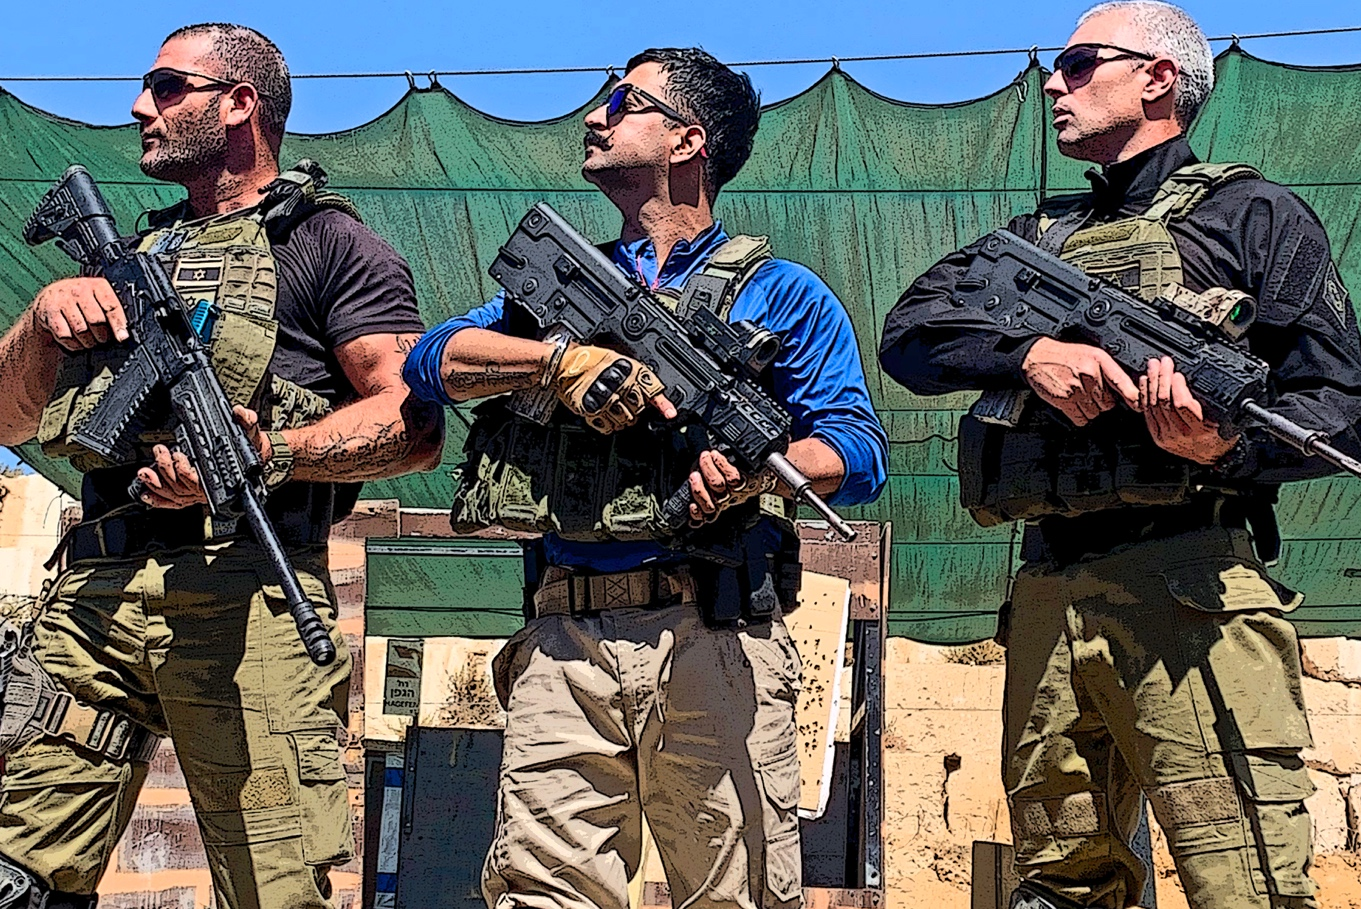 /Users/mrsasbhardwaj/Documents/Mission-Prahar-Grand-Master-Shifuji-Shaurya-Bhardwaj-Commandos-Mentor-Worlds-Best-Commandos-Mentor-Mitti-System-Mitti-Martial-Arts-Jai-Hind ,Caliber-3-Israel- Colonel-Col-Sharon-Gat-Eatan-Cohen-Eitan-Chohen-Israel-Defence-Force-IDF-Special-Forces  dd.jpg